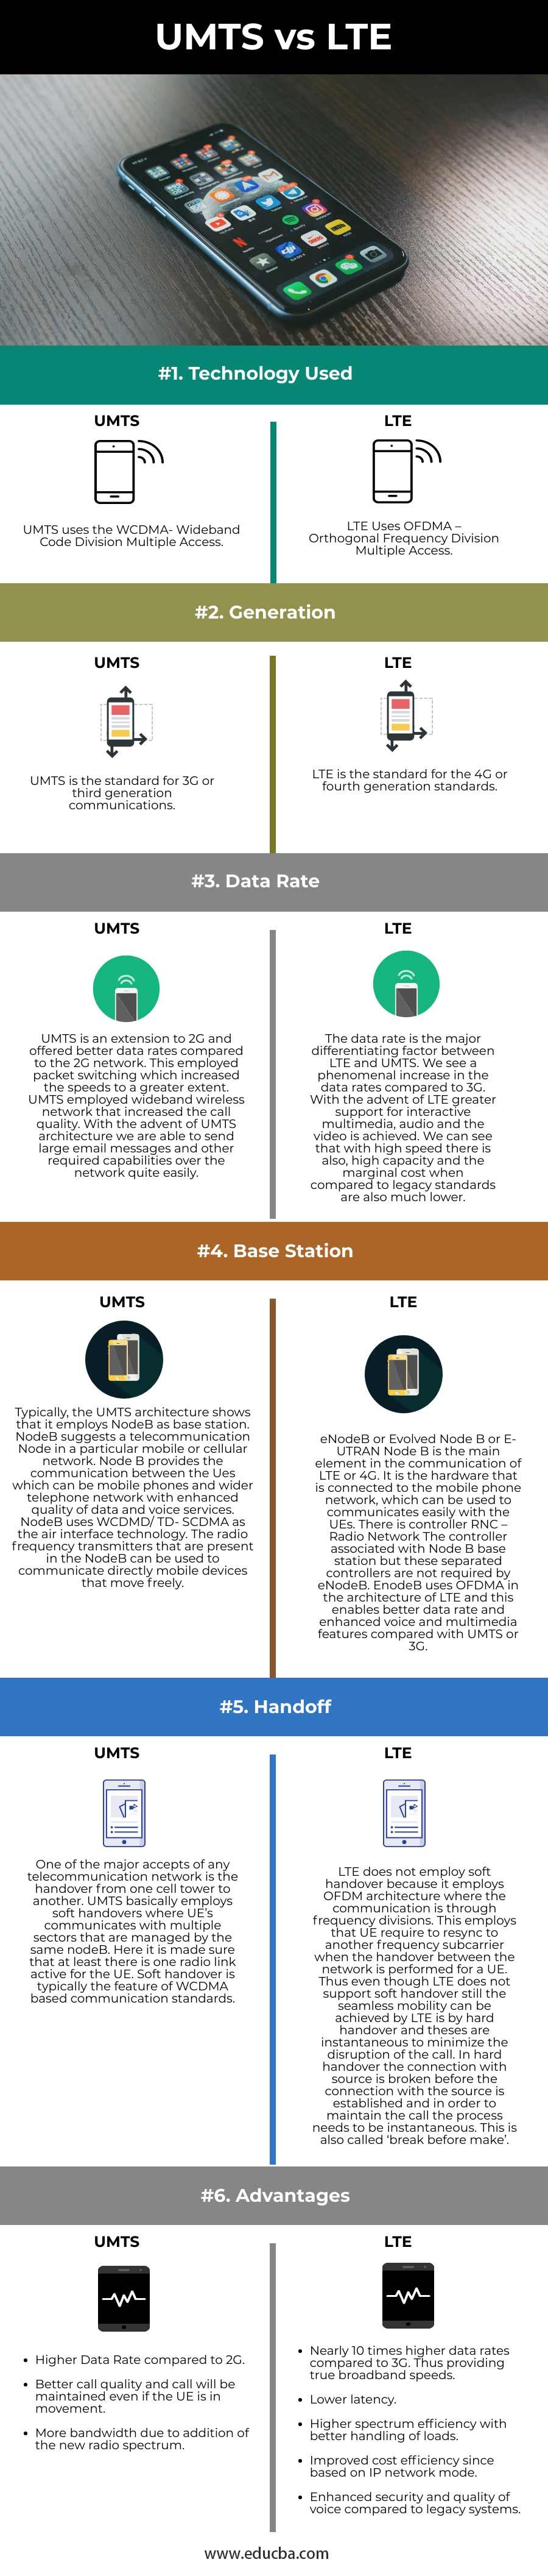 UMTS-vs-LTE-info